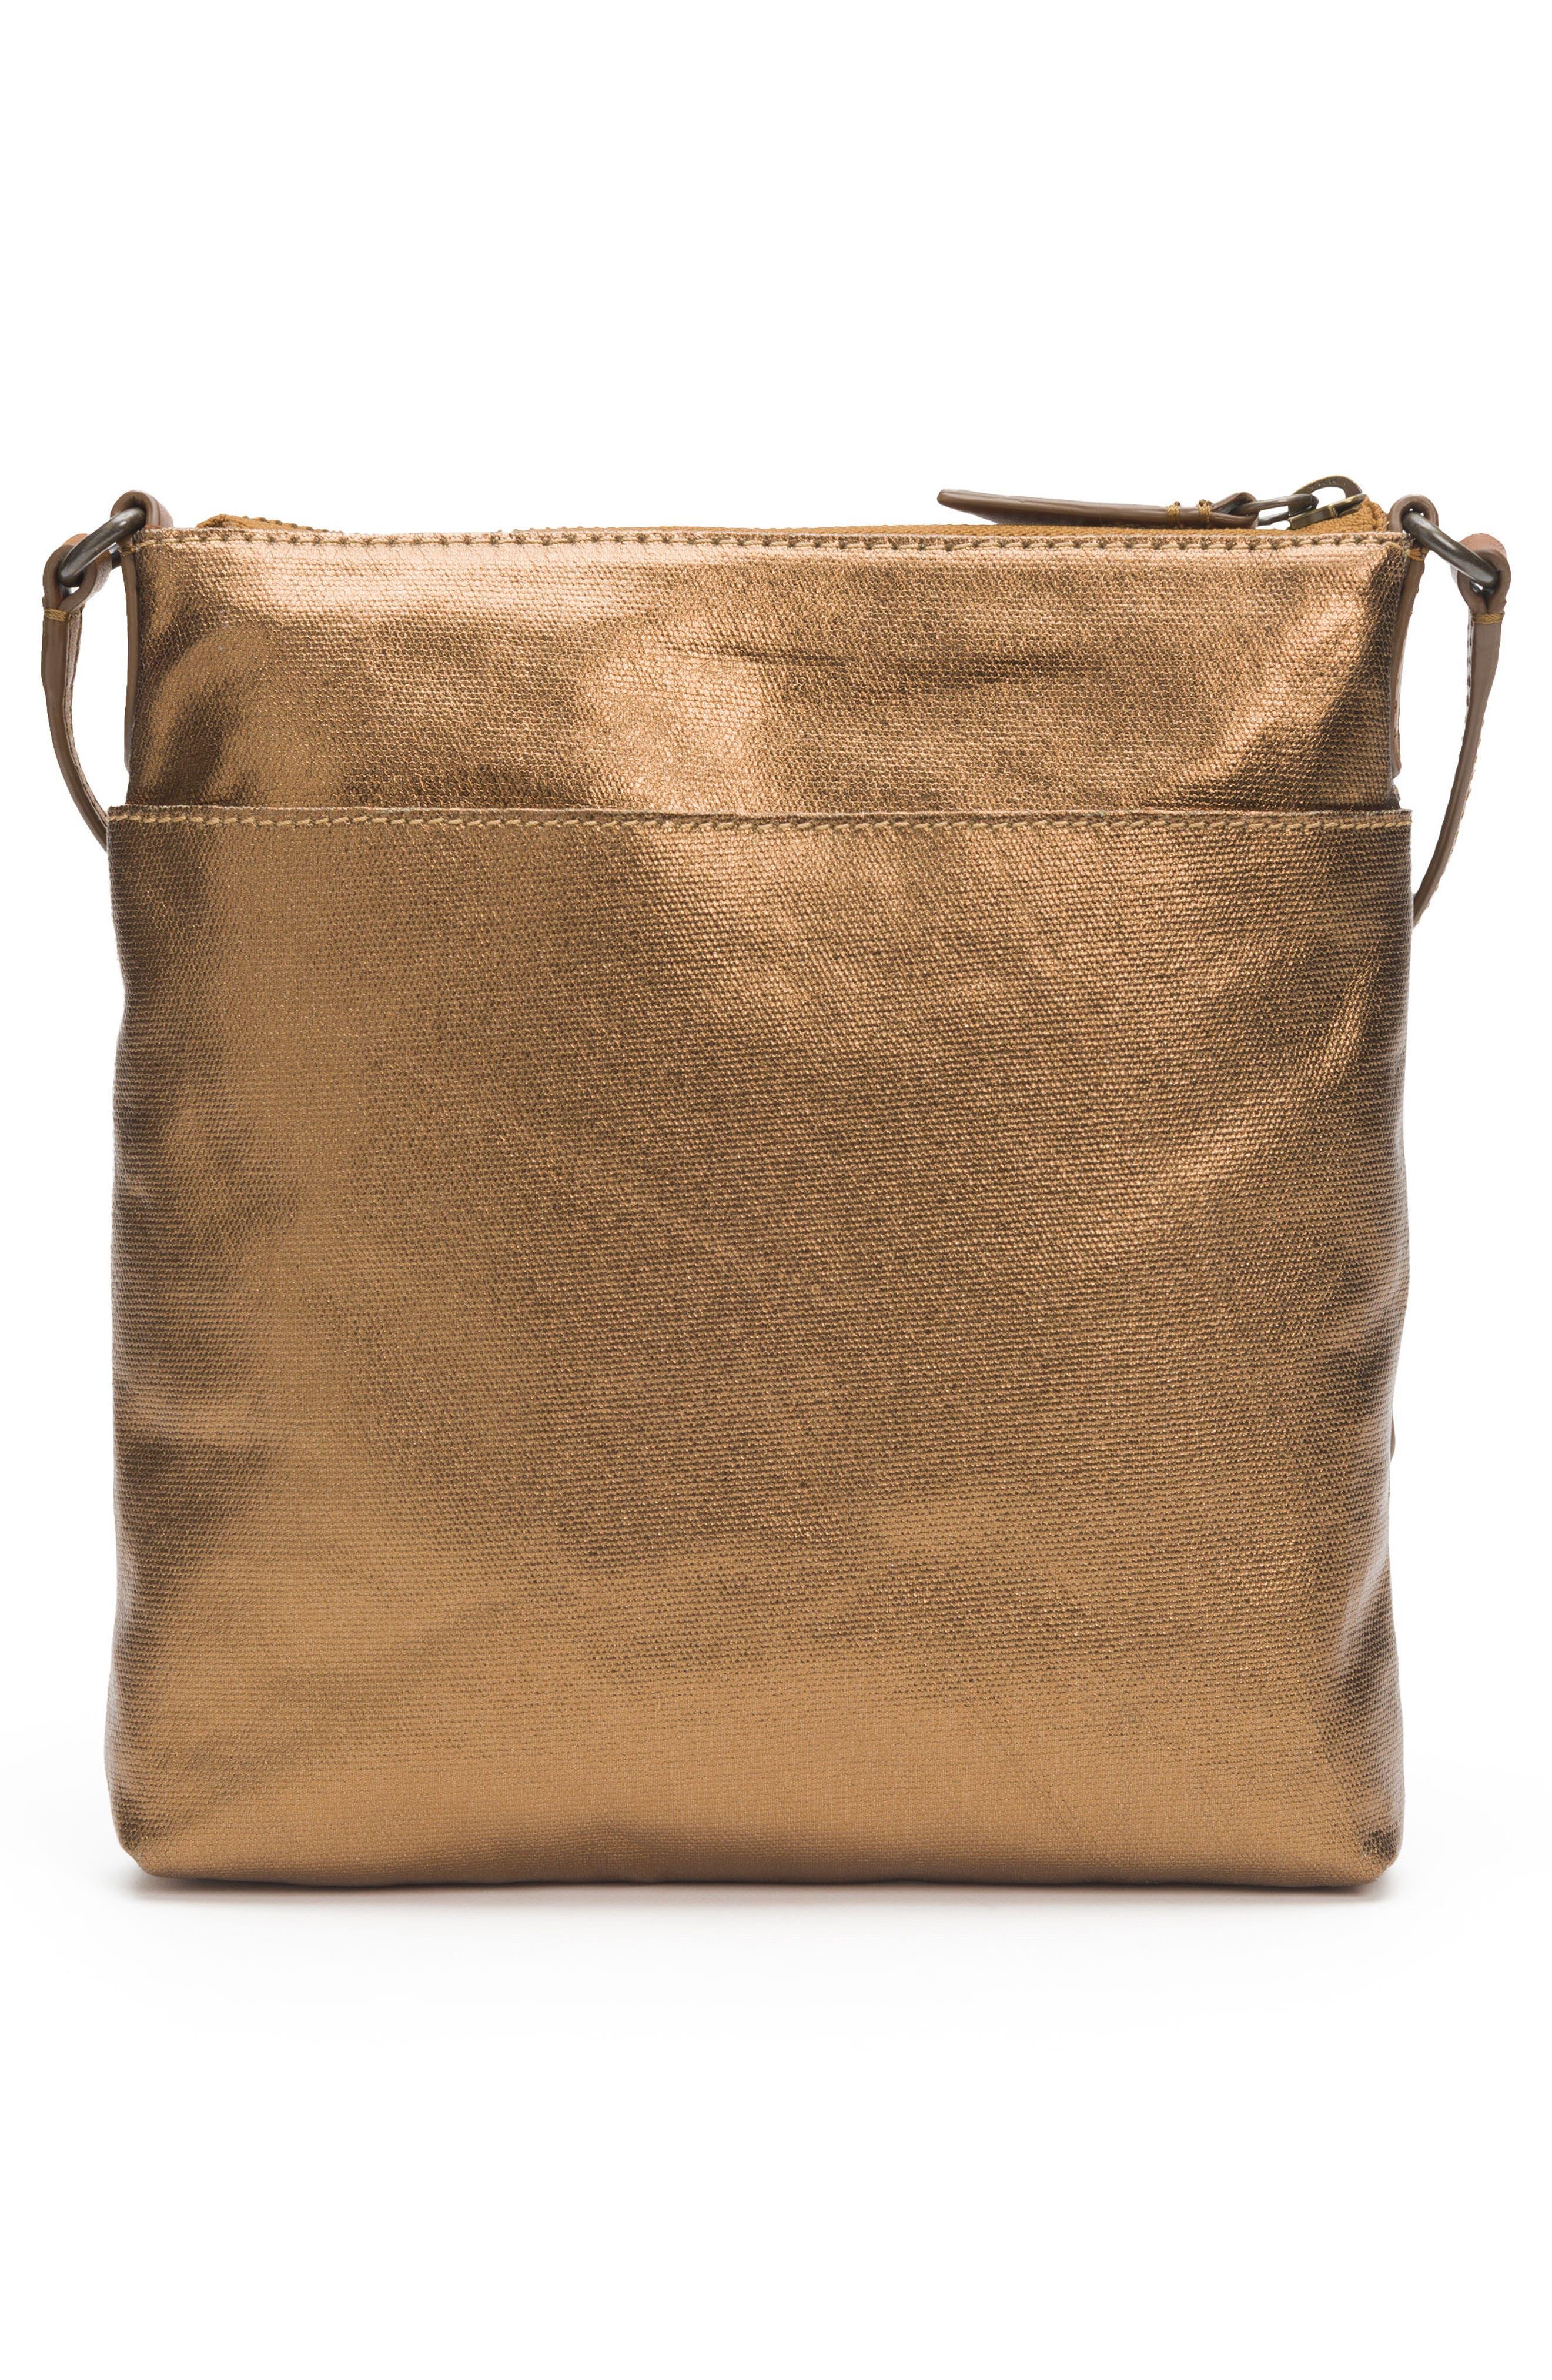 Ivy Metallic Nylon Crossbody Bag,                             Alternate thumbnail 3, color,                             Bronze